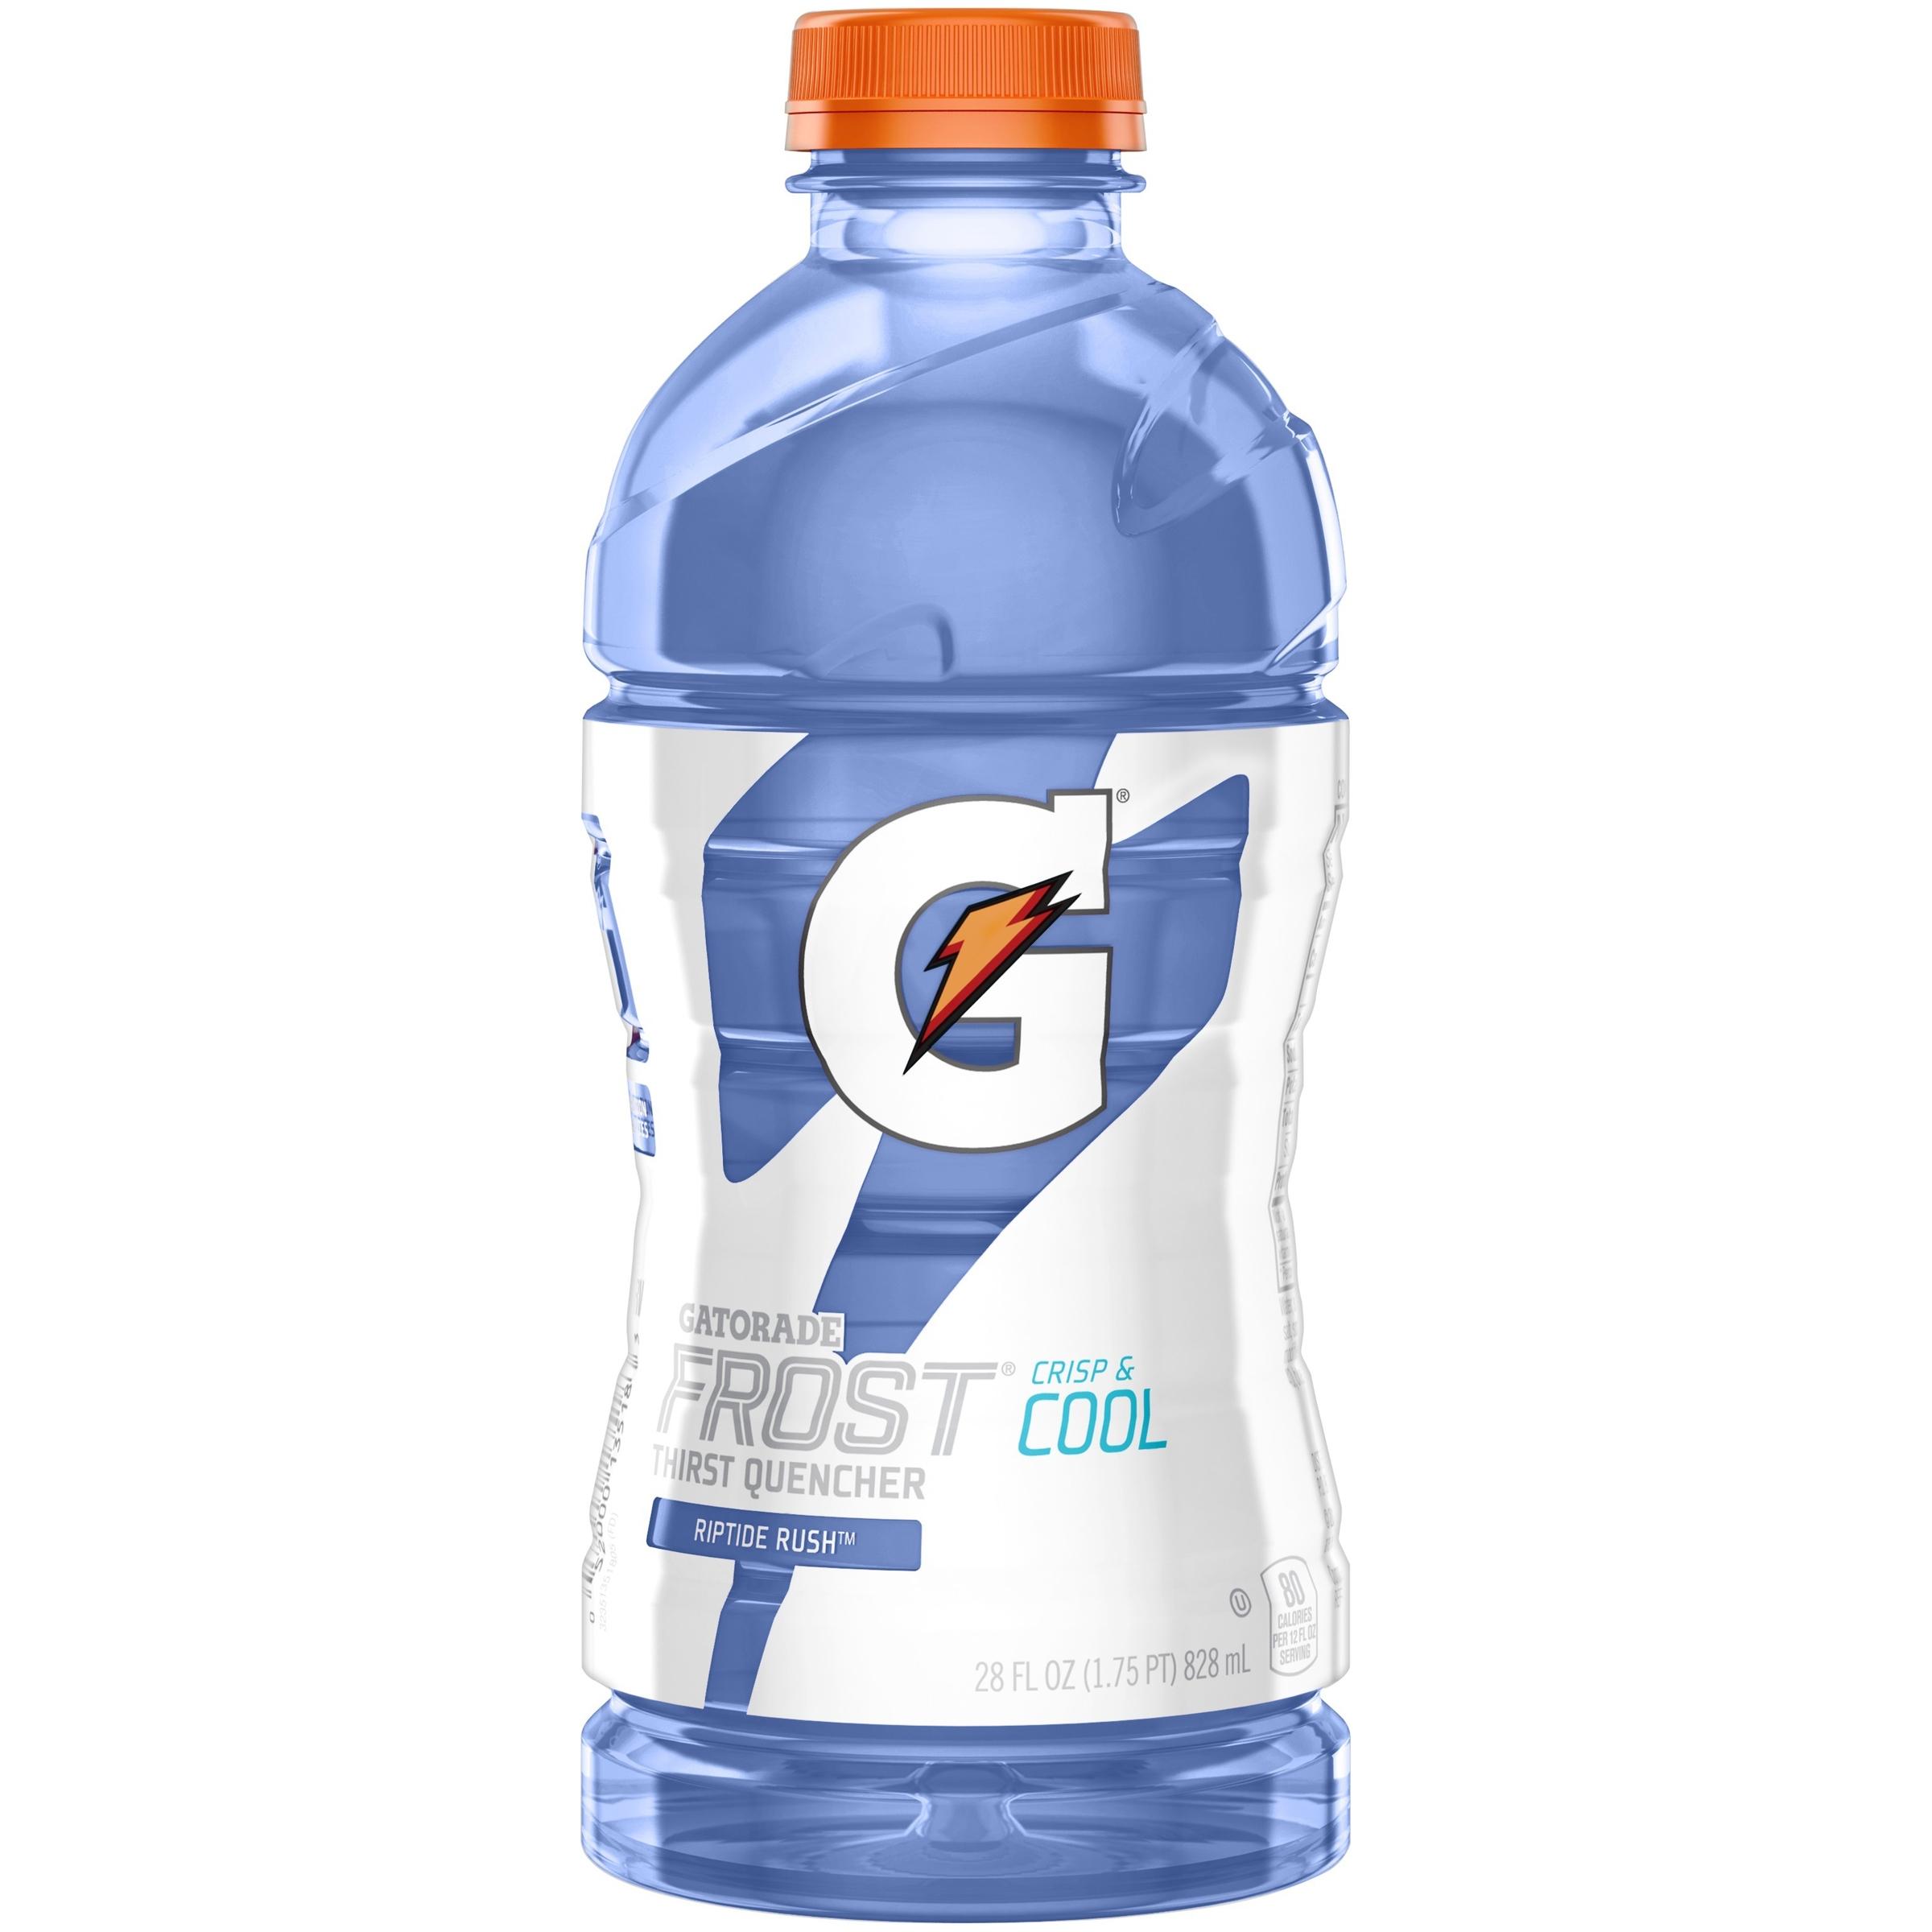 Gatorade Frost Thirst Quencher Riptide Rush Sports Drink 28 fl. oz Plastic Bottle